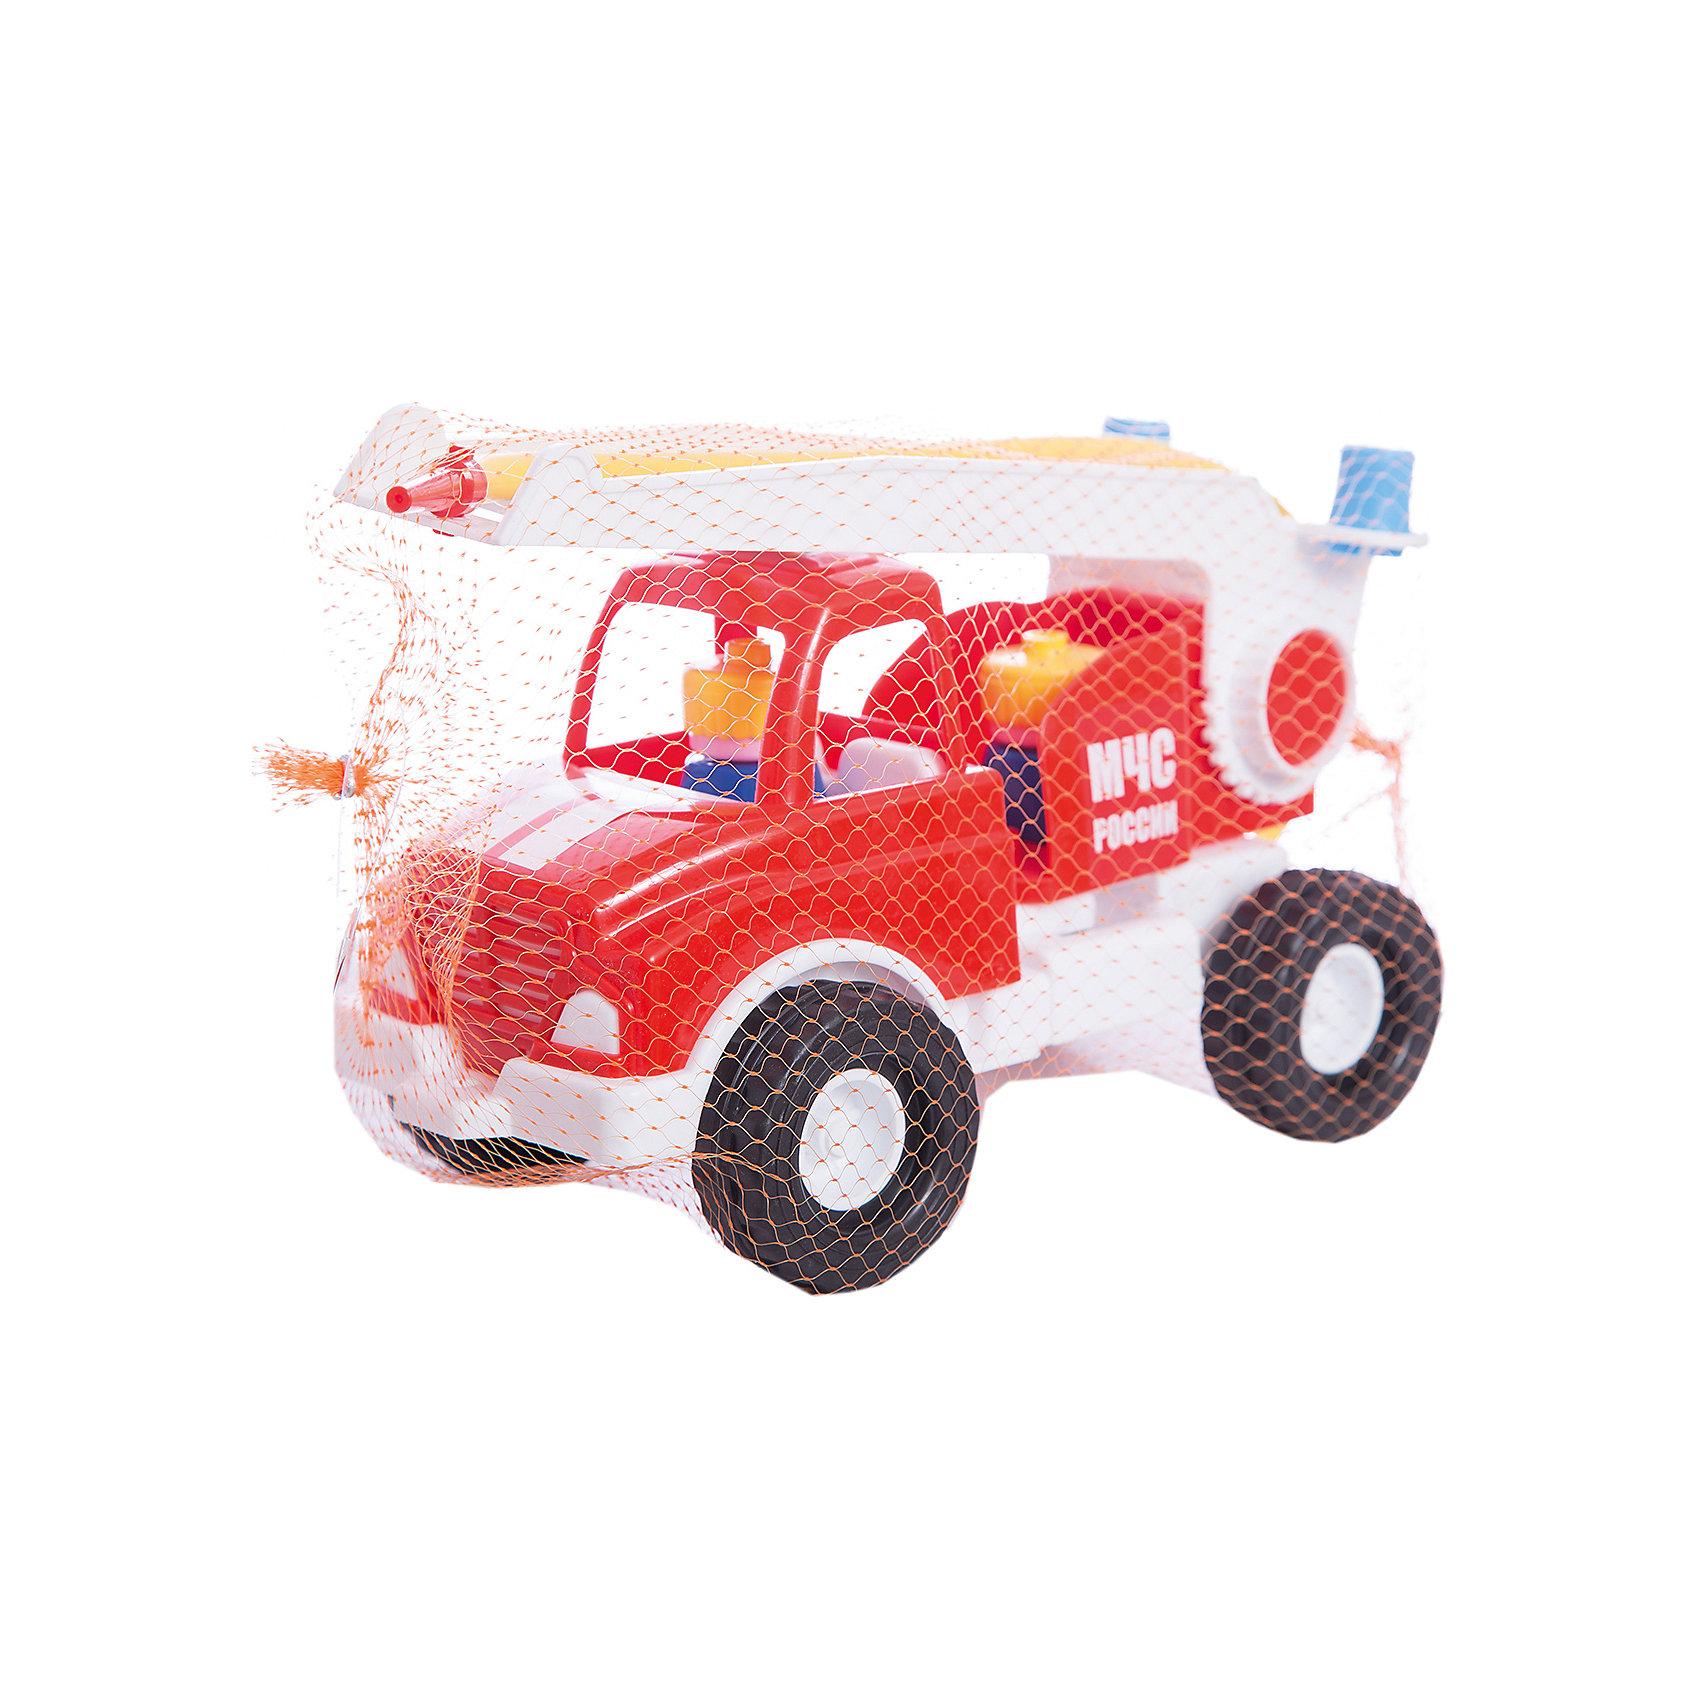 Стеллар Стеллар Пожарная машина стеллар домино обитатели леса стеллар